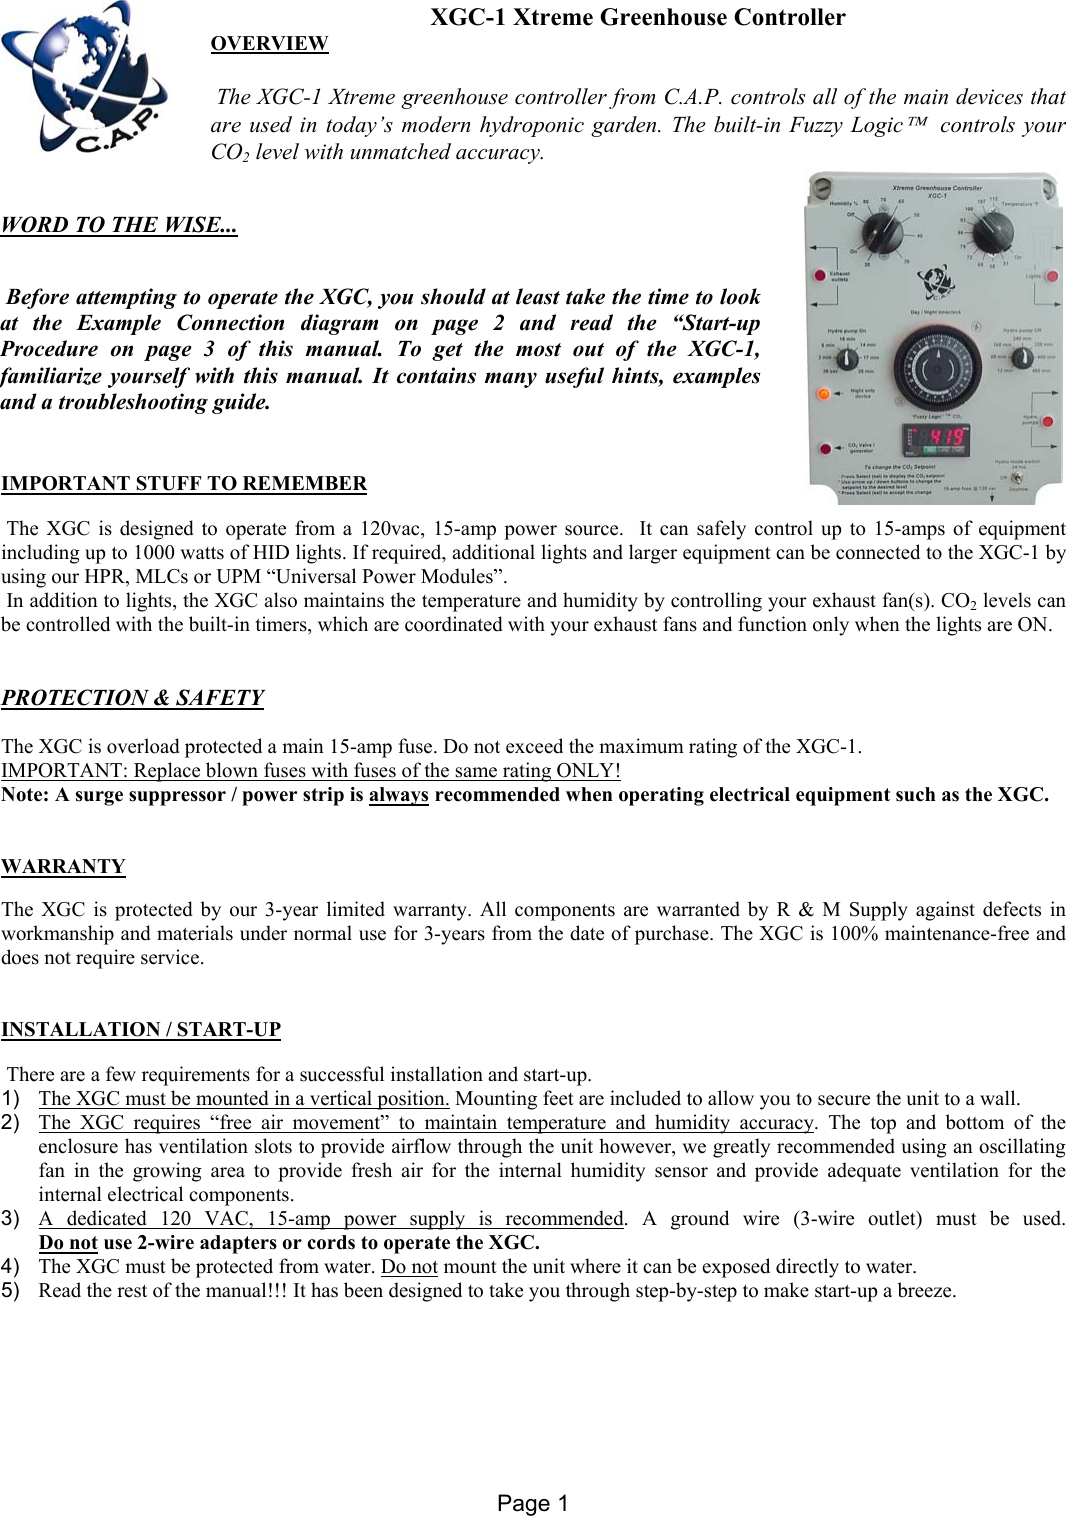 Xtrememac Xgc 1 Users Manual Summary Mlc Light Controller Wiring Diagram